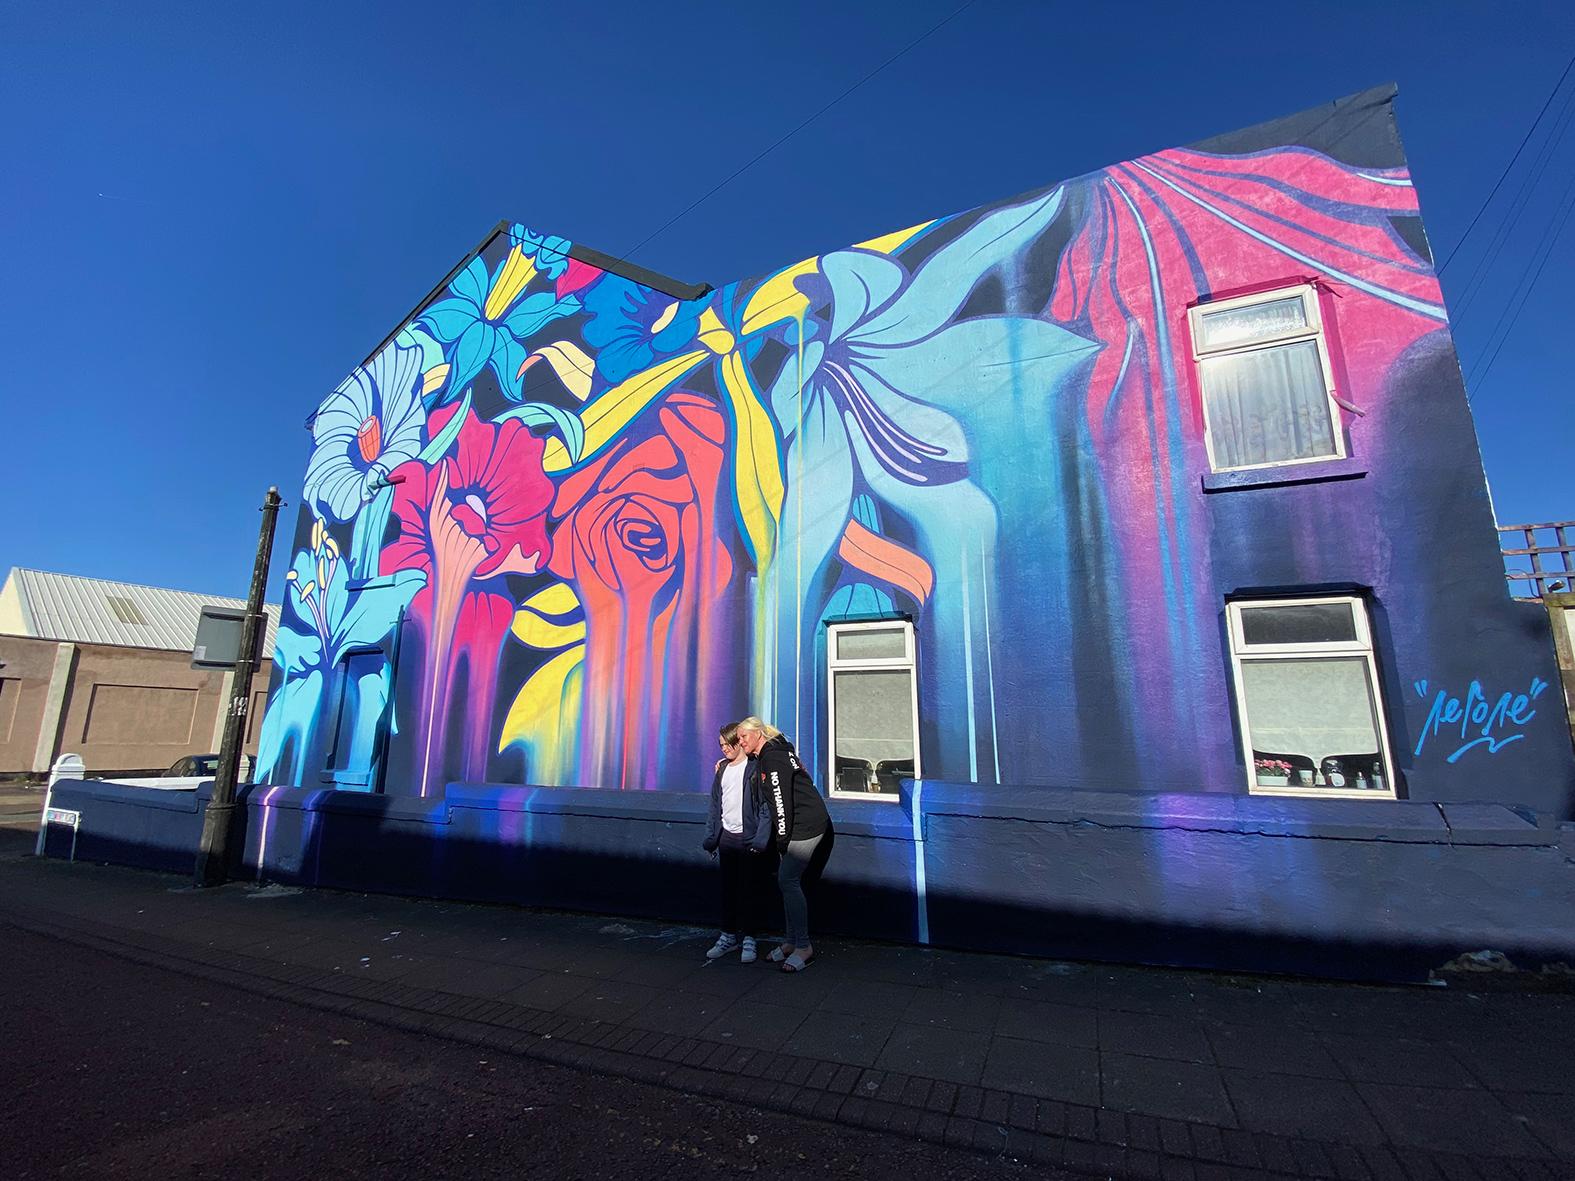 Nerone-New-brighton-street-art-3